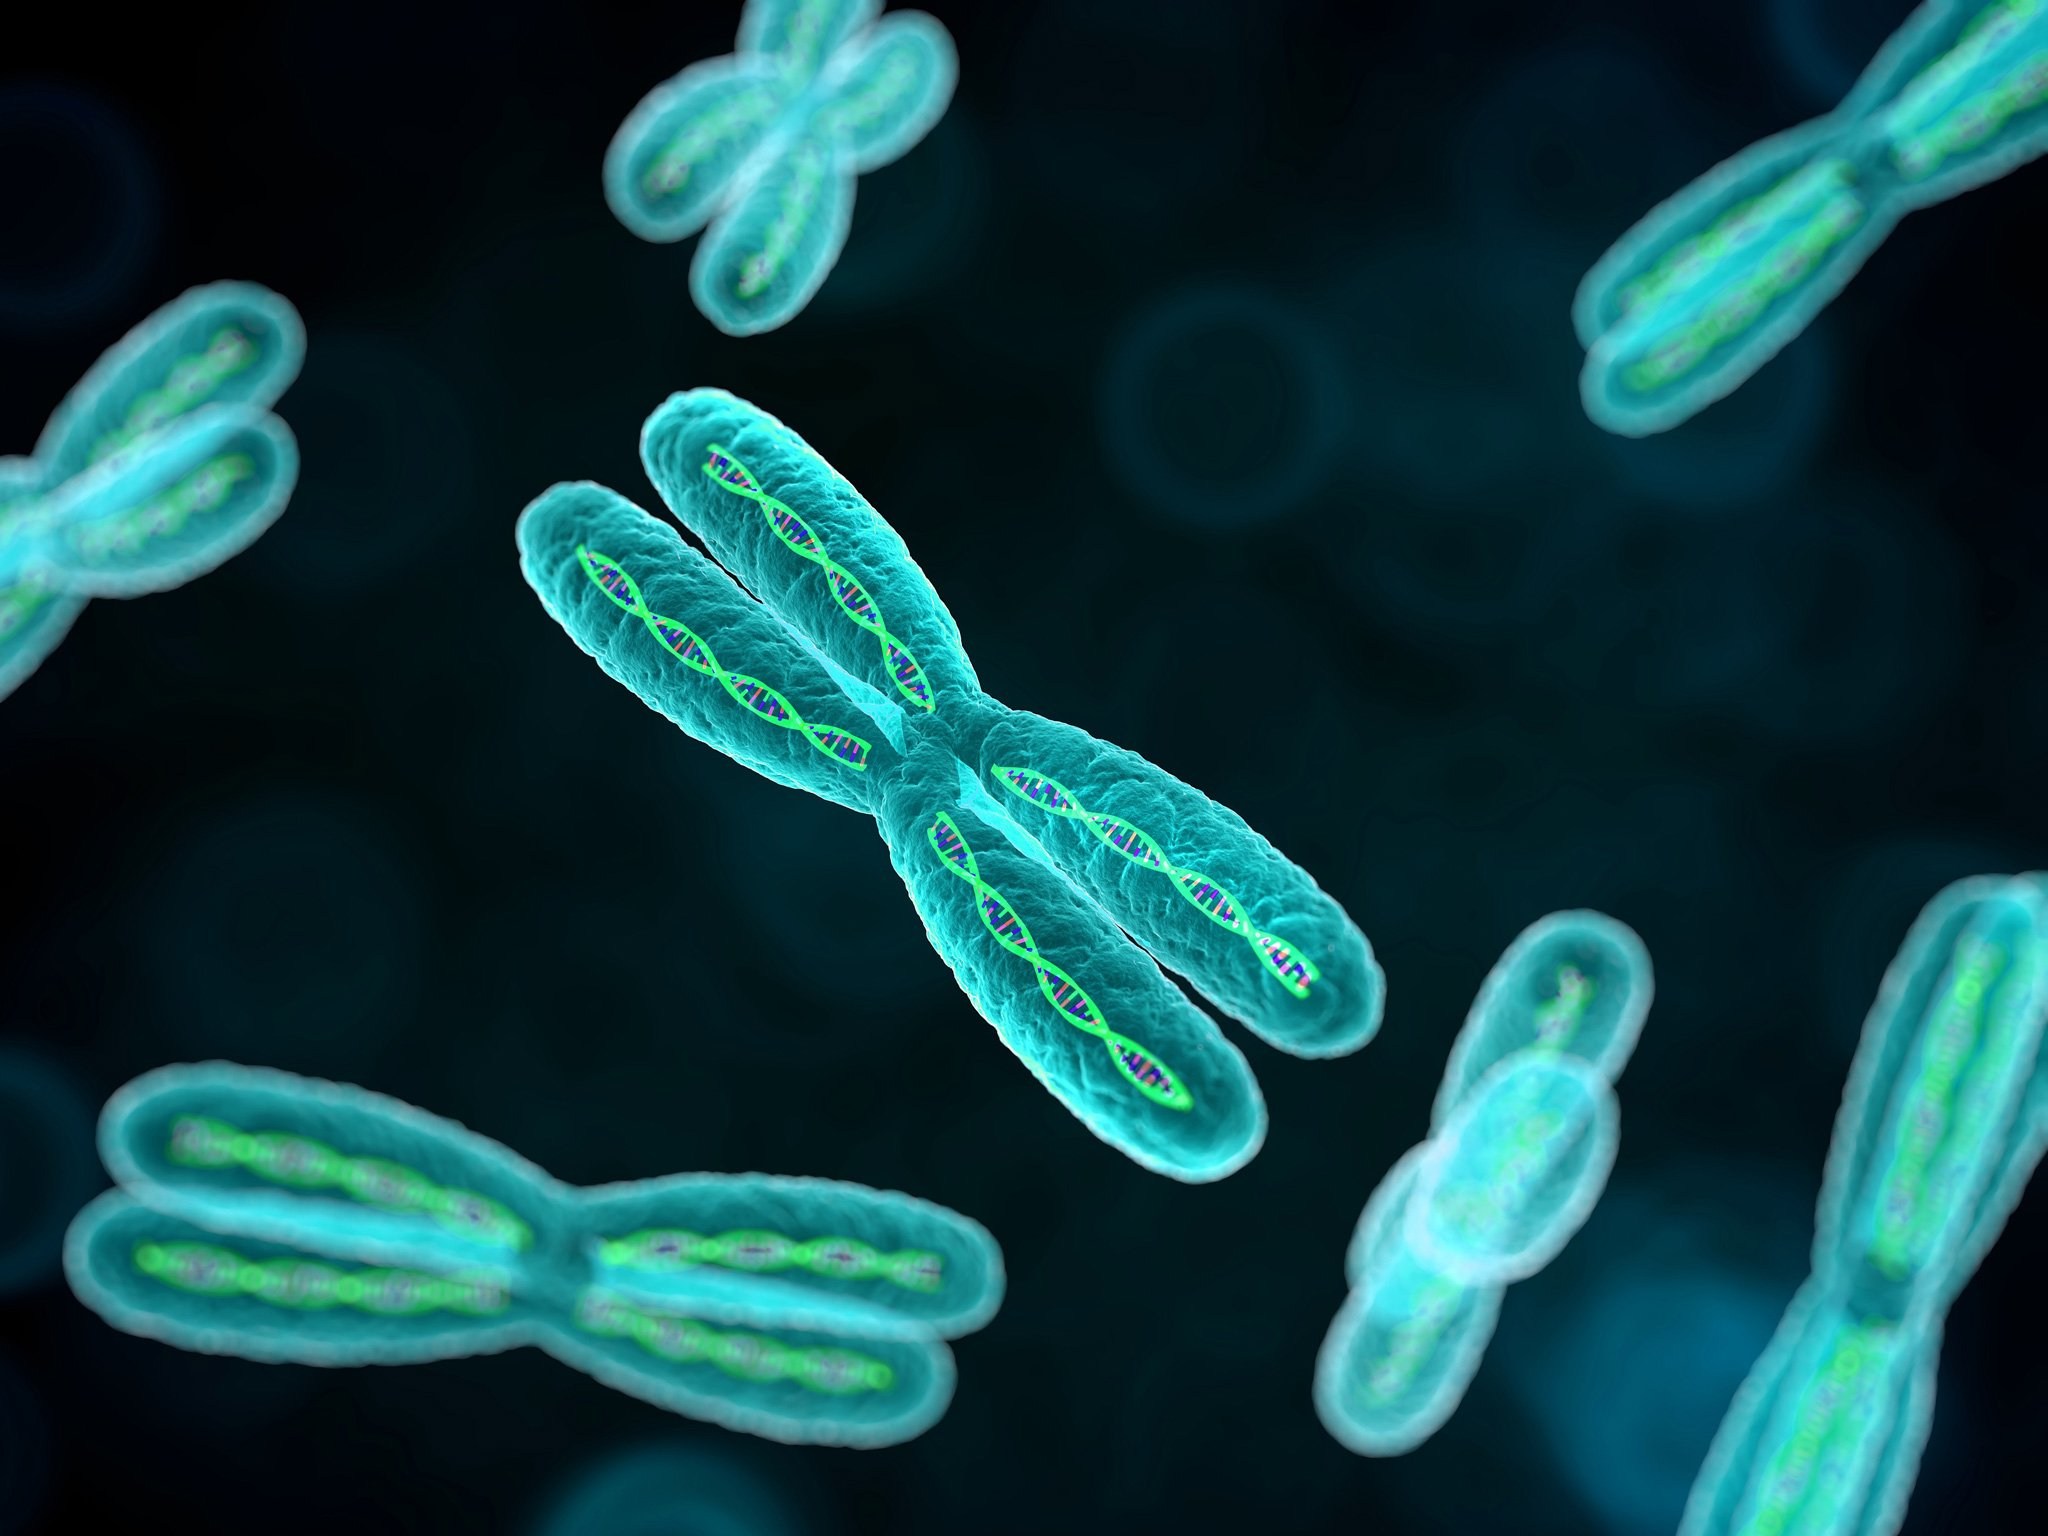 хромосомы у человека картинки